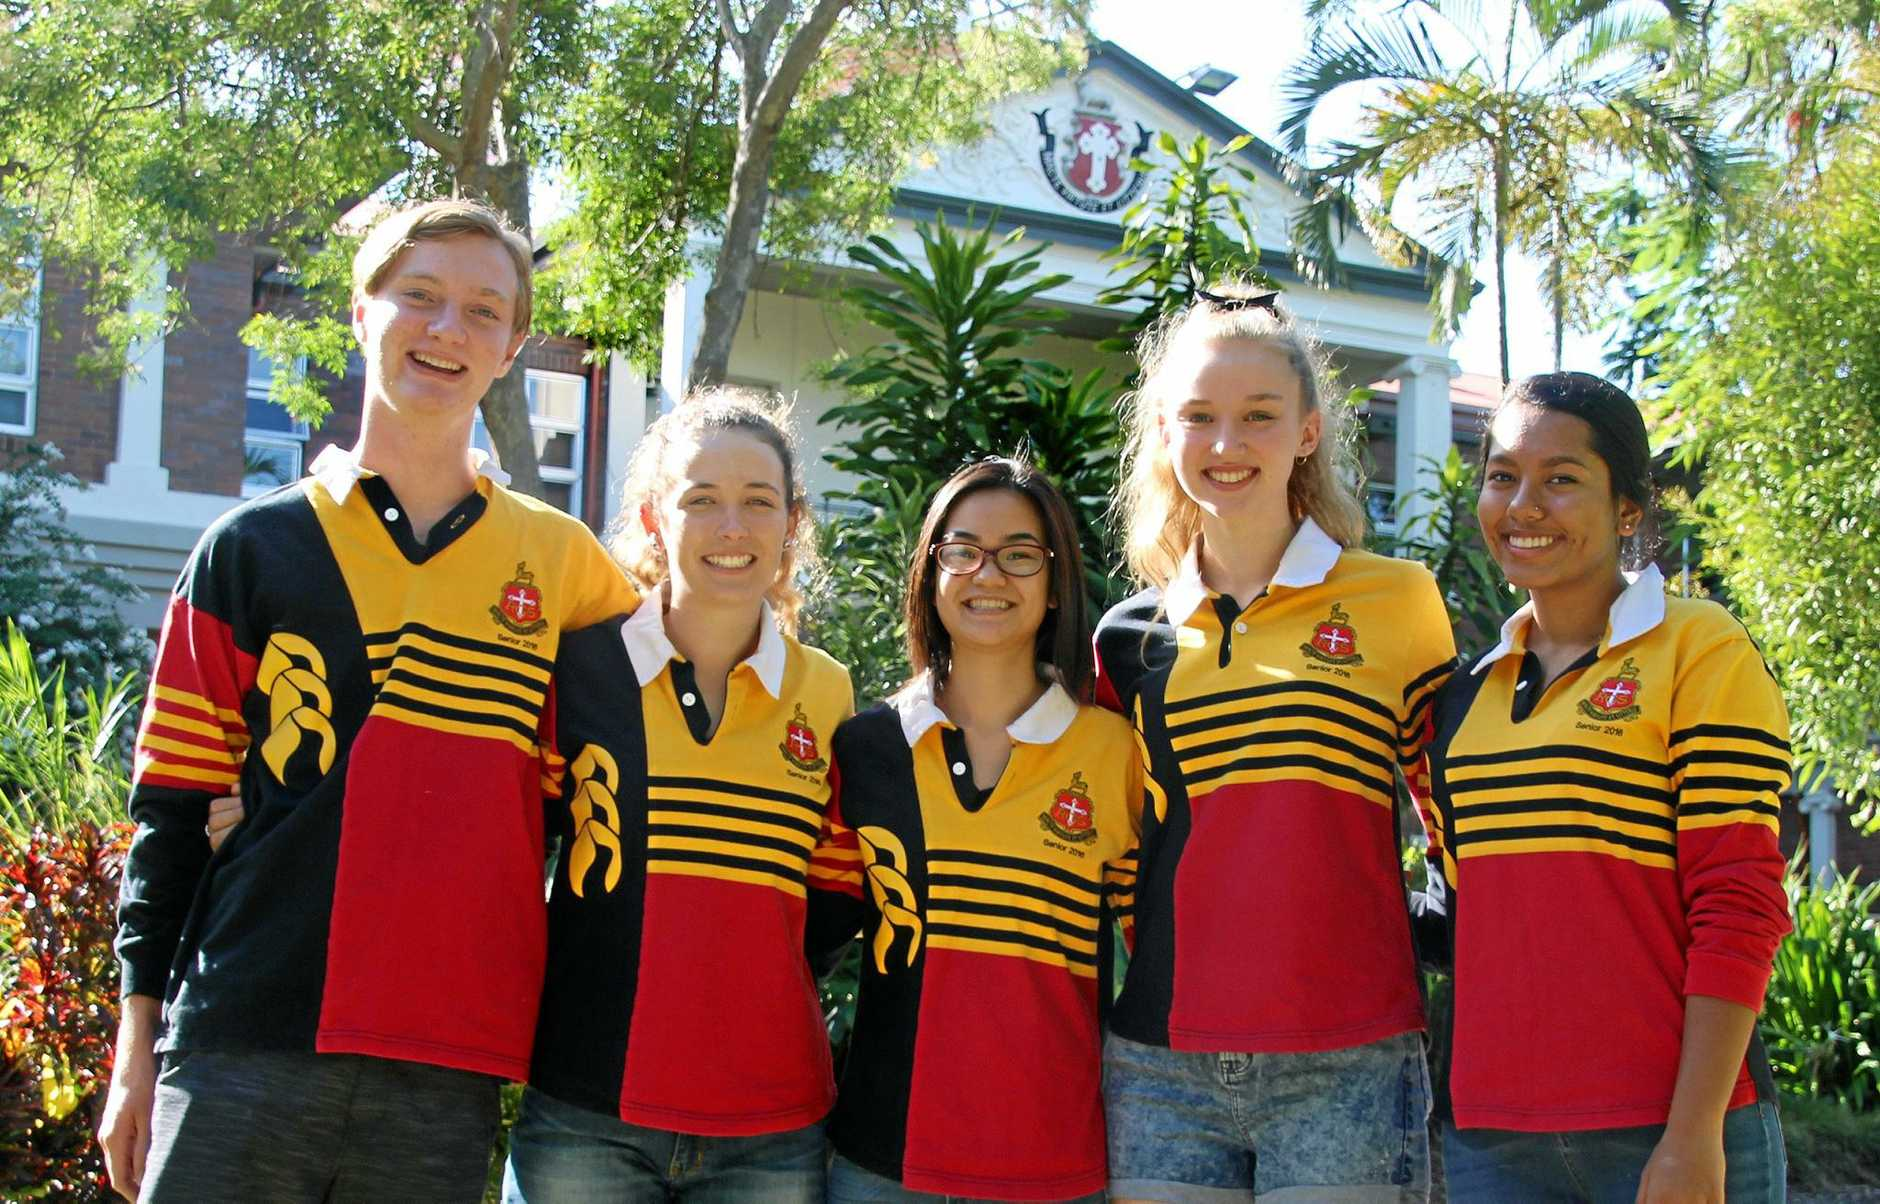 The Rockhampton Grammar School's OP 1 students Tomas Beak, Sarah MacKenzie, Emma Wong, Gabrielle Matthews and Aniqa Hussain celebrate their results on Saturday.